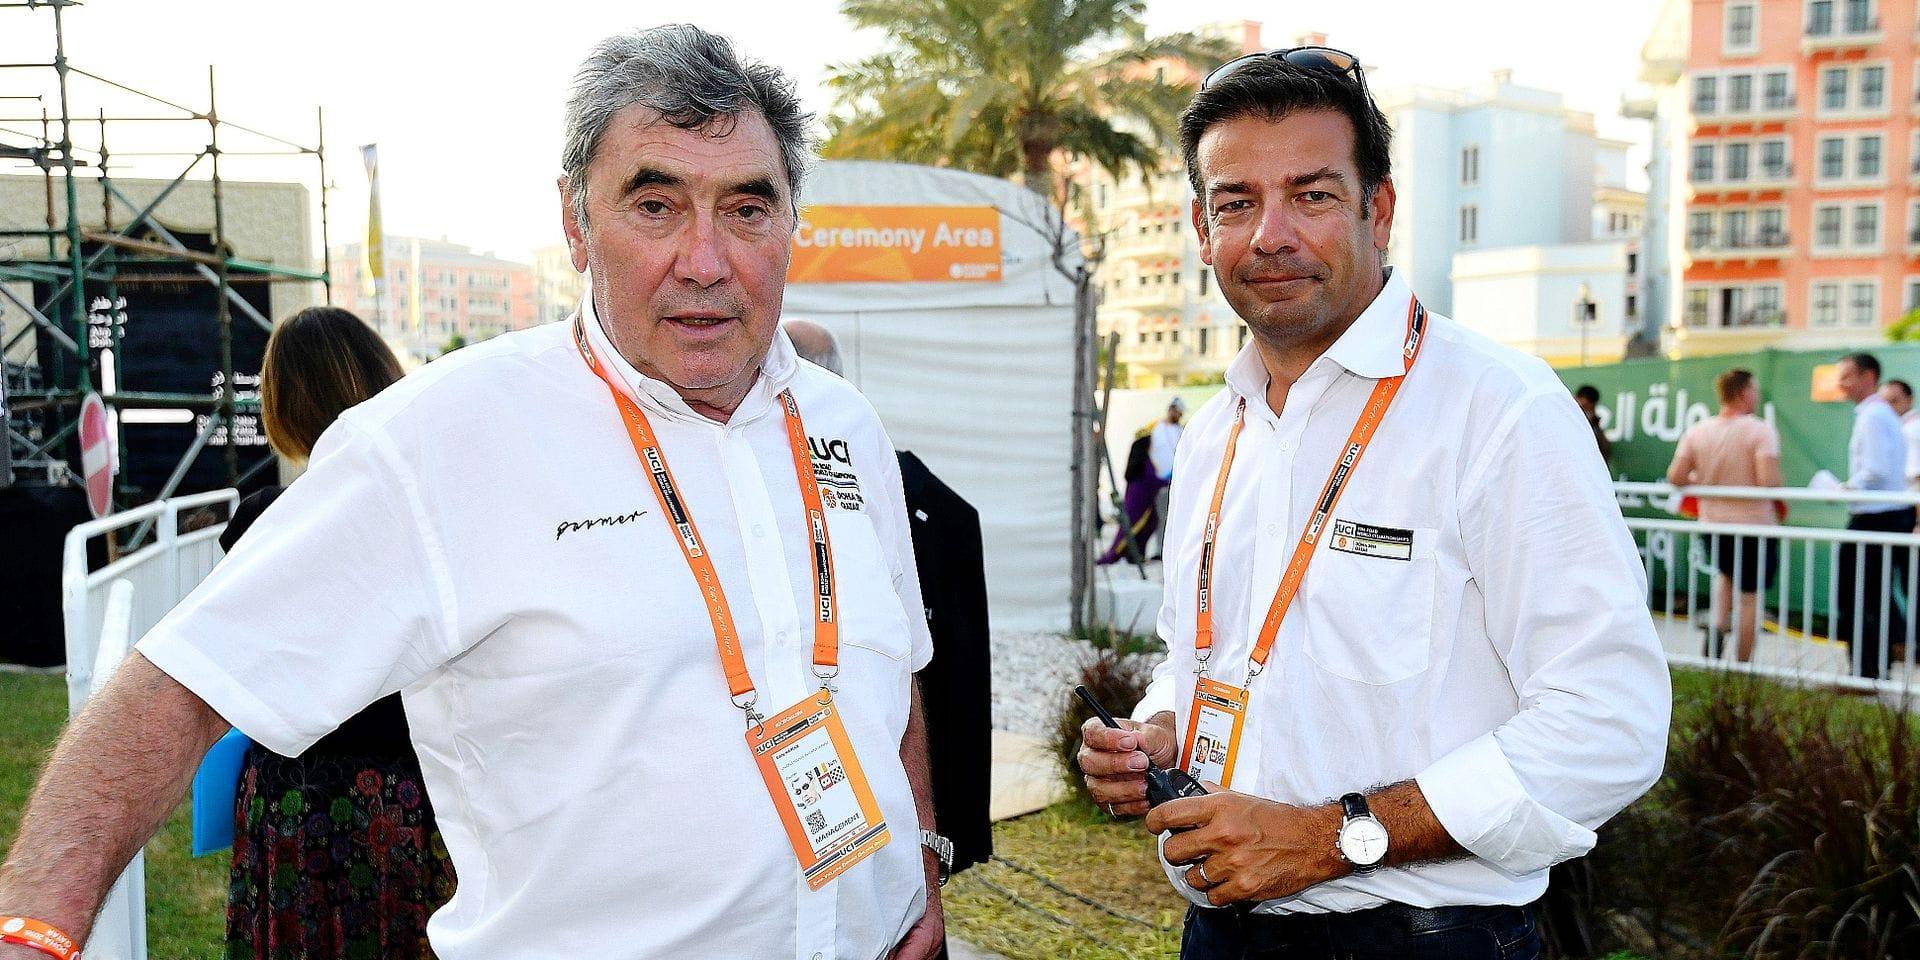 UCI Road World Championships Doha - Day 1